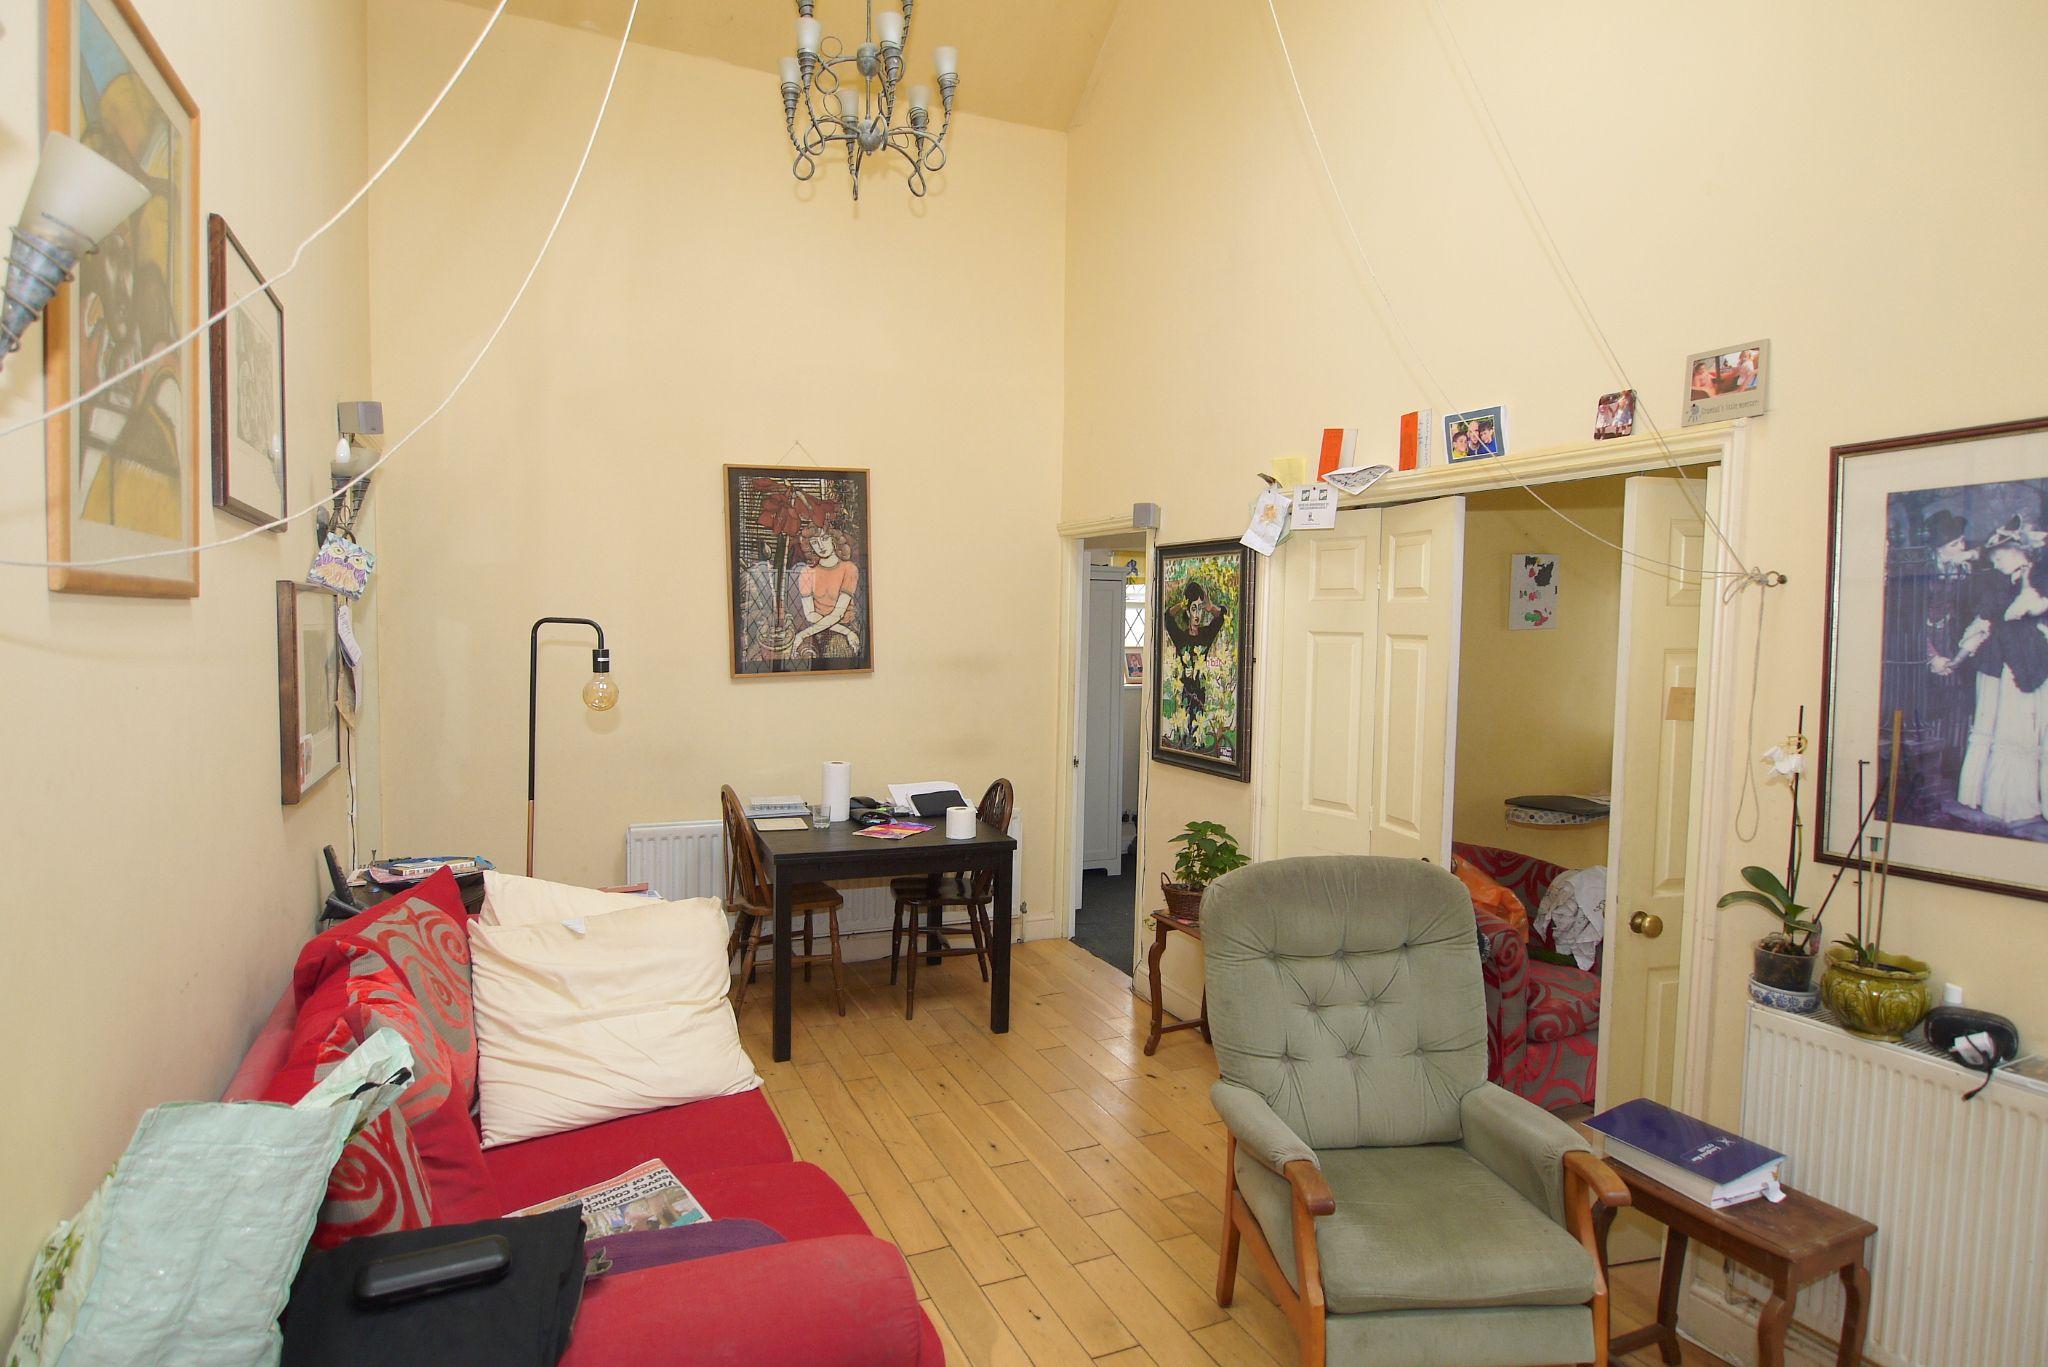 4 bedroom detached bungalow Sold in Sevenoaks - Photograph 2